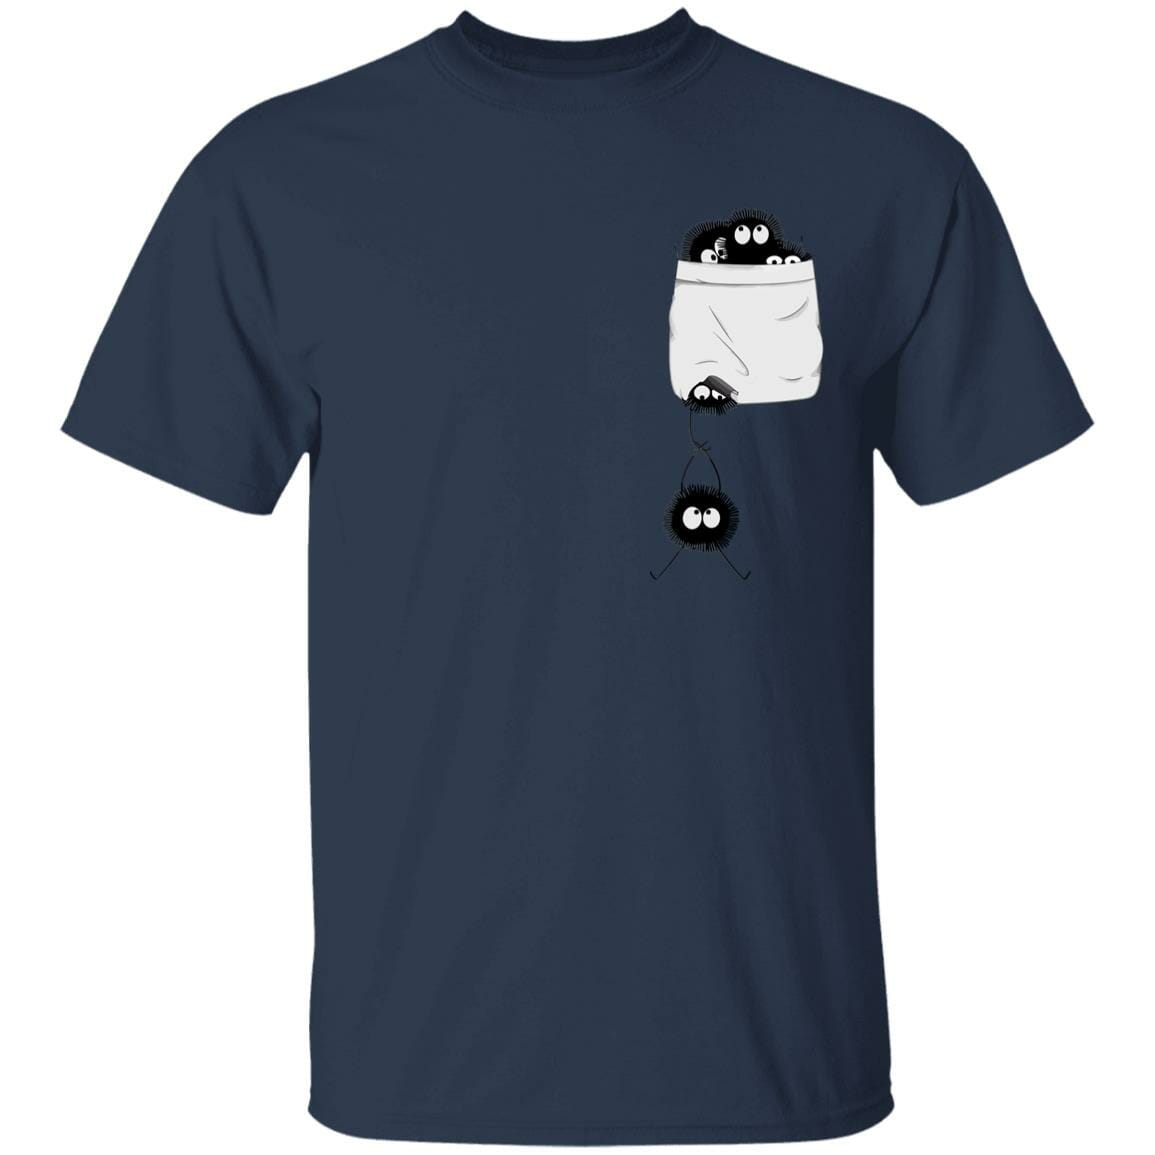 Spirited Away – Soot Ball in pocket T Shirt